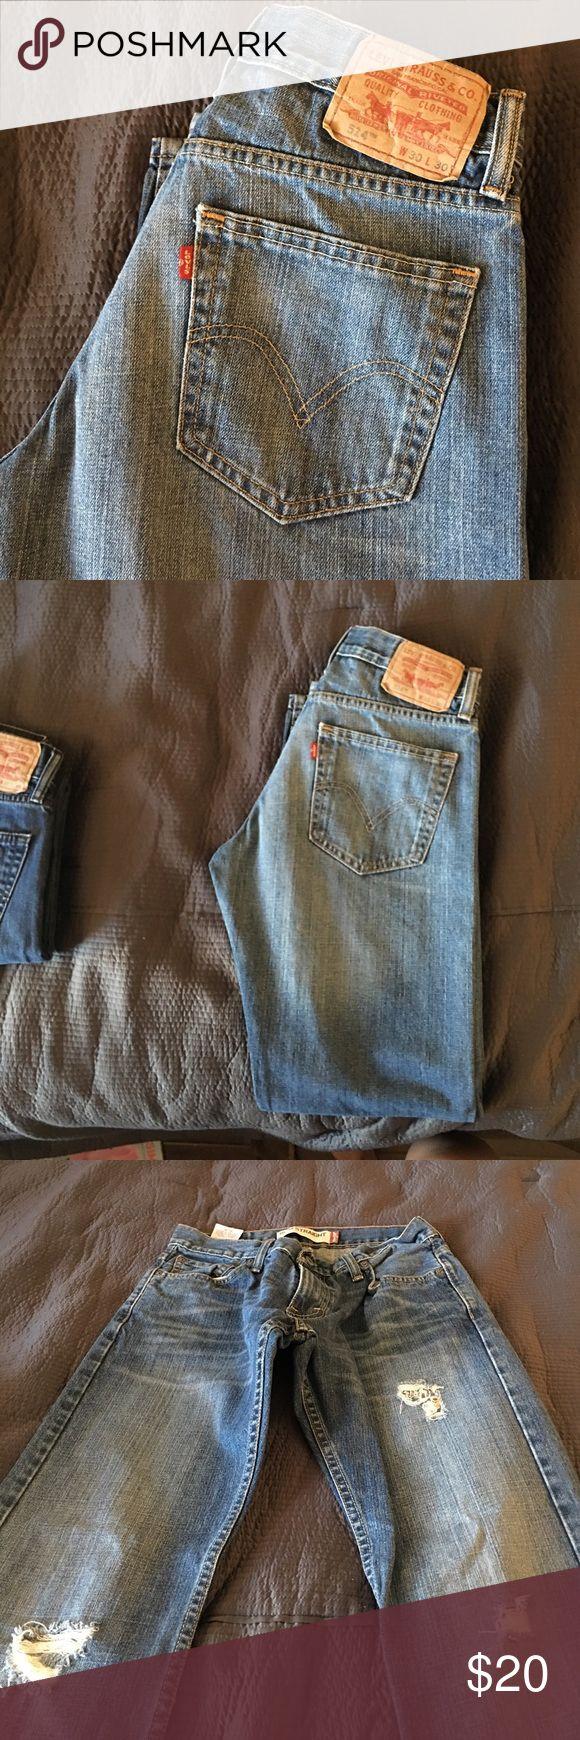 Levi's 514 distressed Levi's 514,  blue denim, size 30/30 slim straight a little bit of a distressed look.euc Levi's Jeans Slim Straight